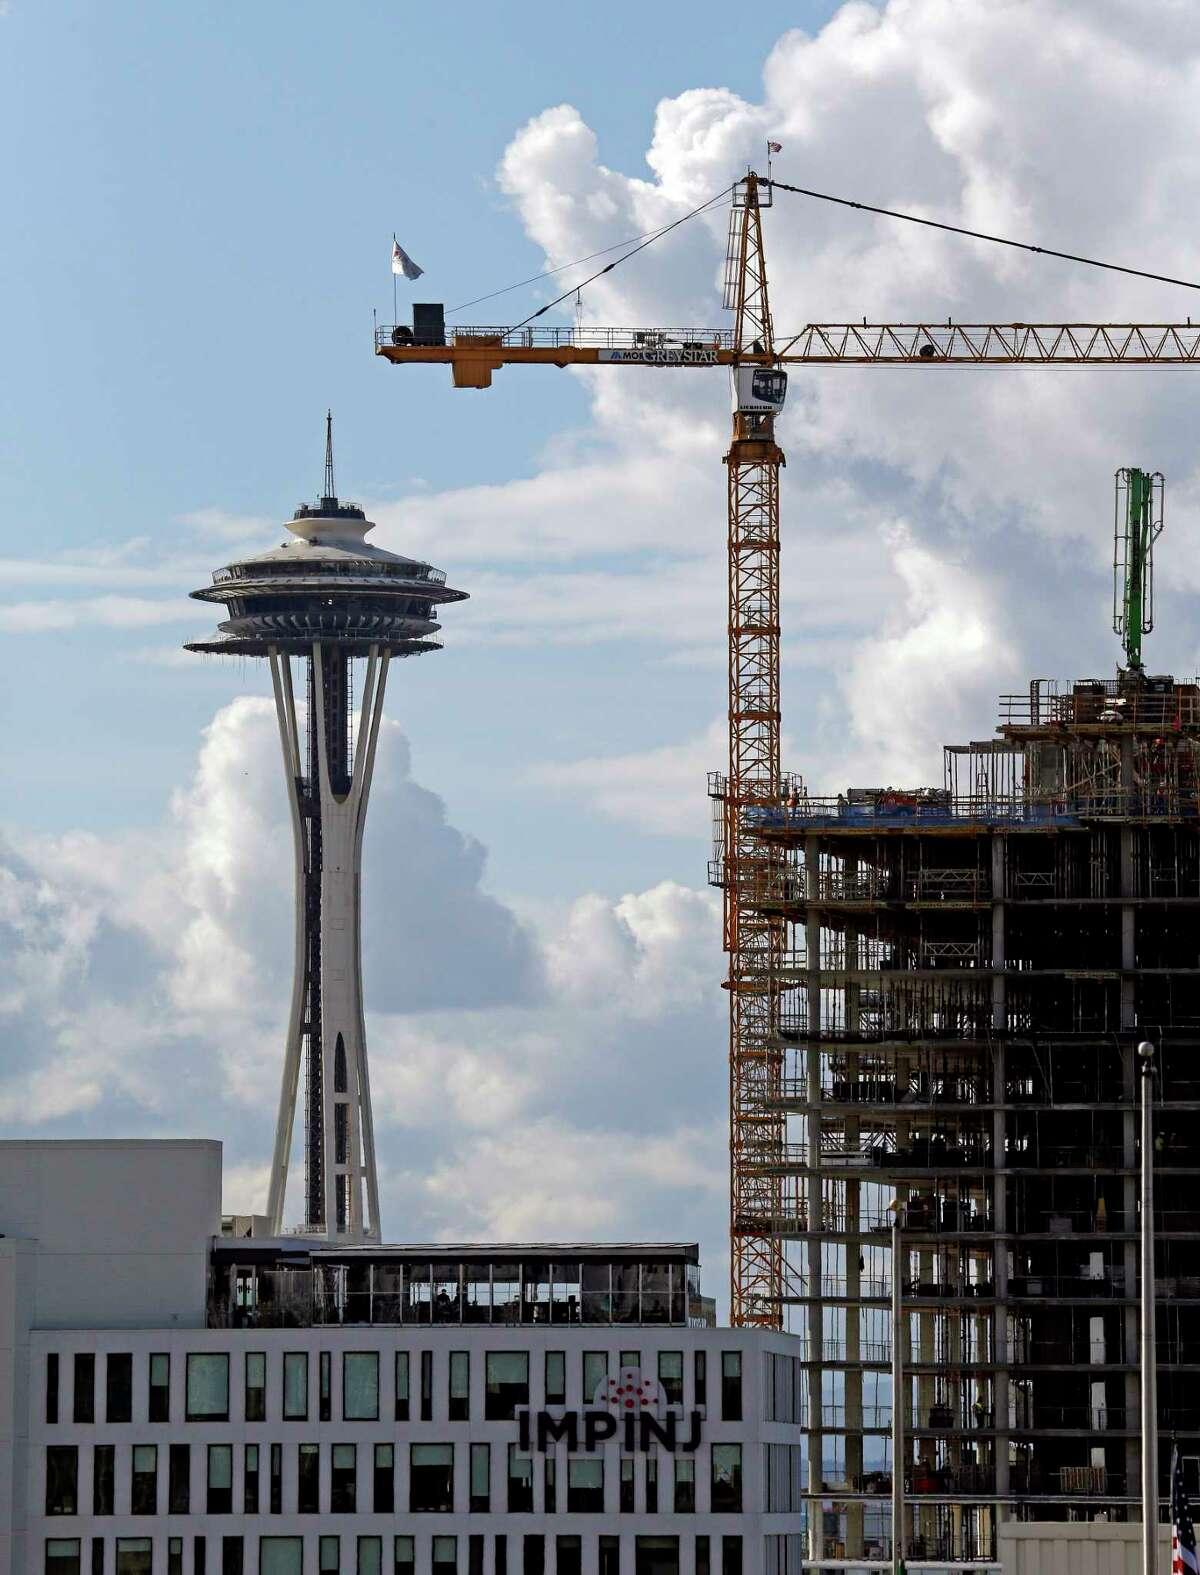 1. Seattle 65 cranes